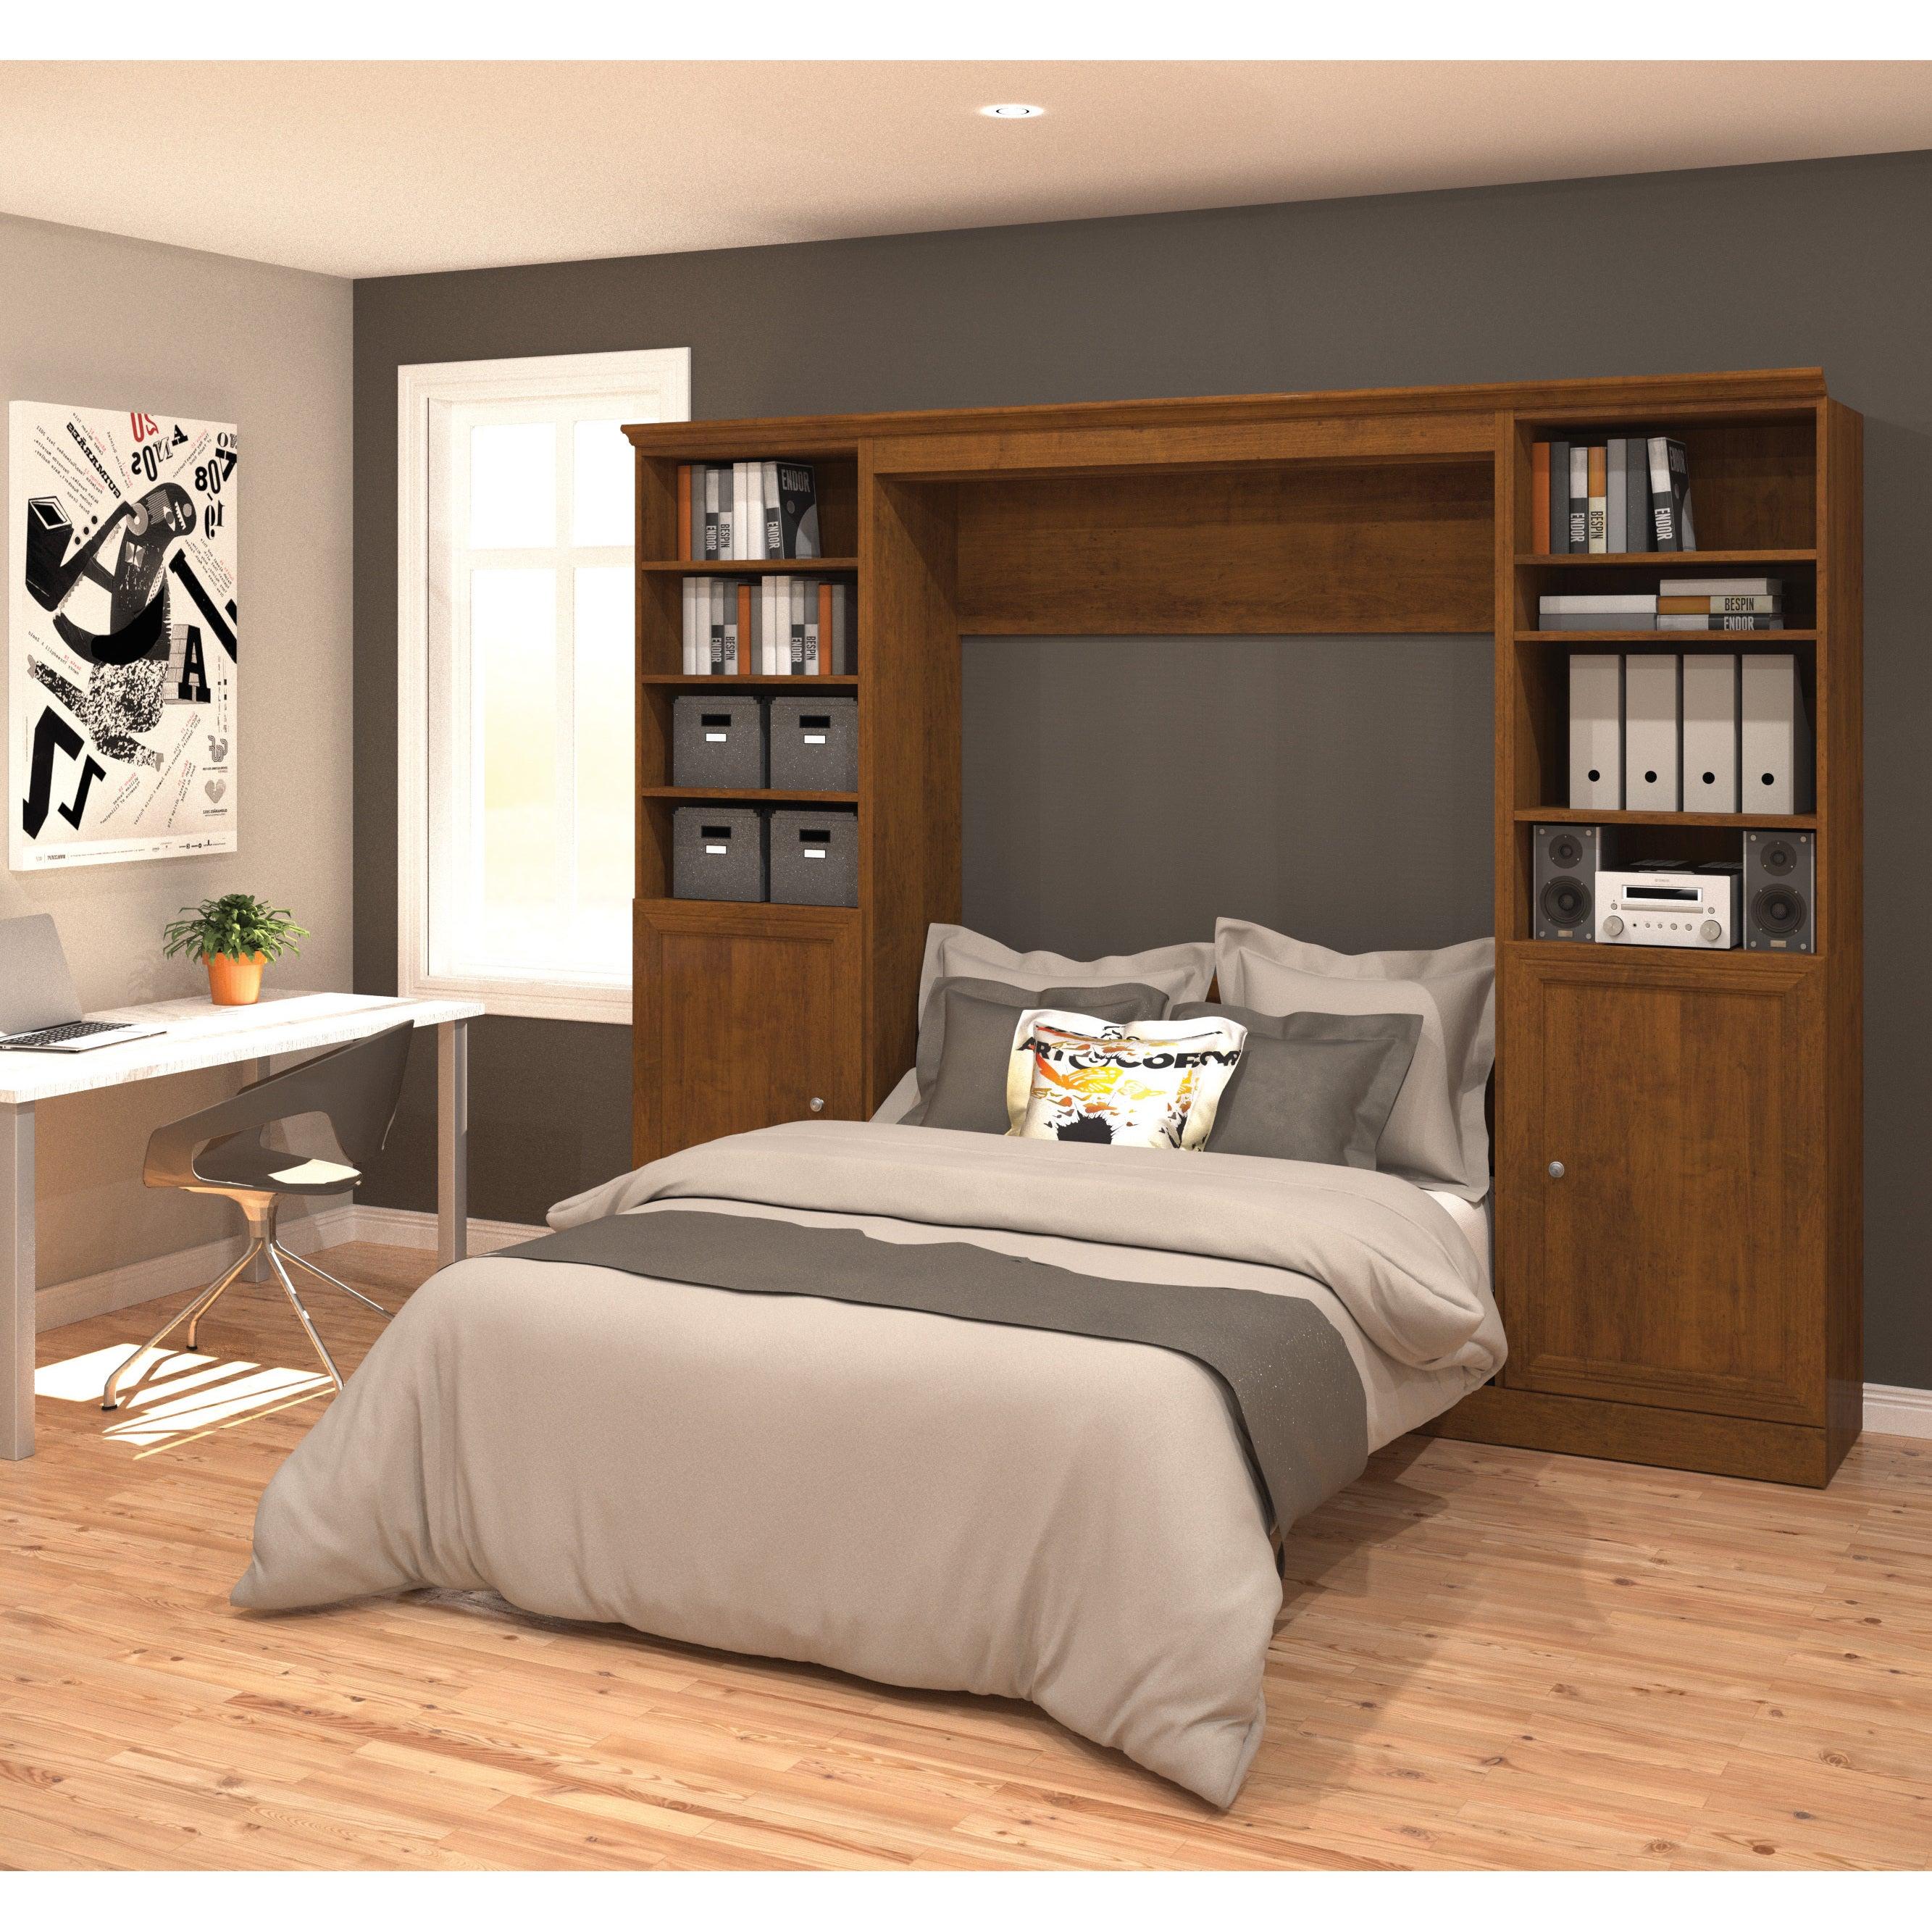 Versatile by Bestar 109-inch Full Wall Bed Kit (Brown - B...